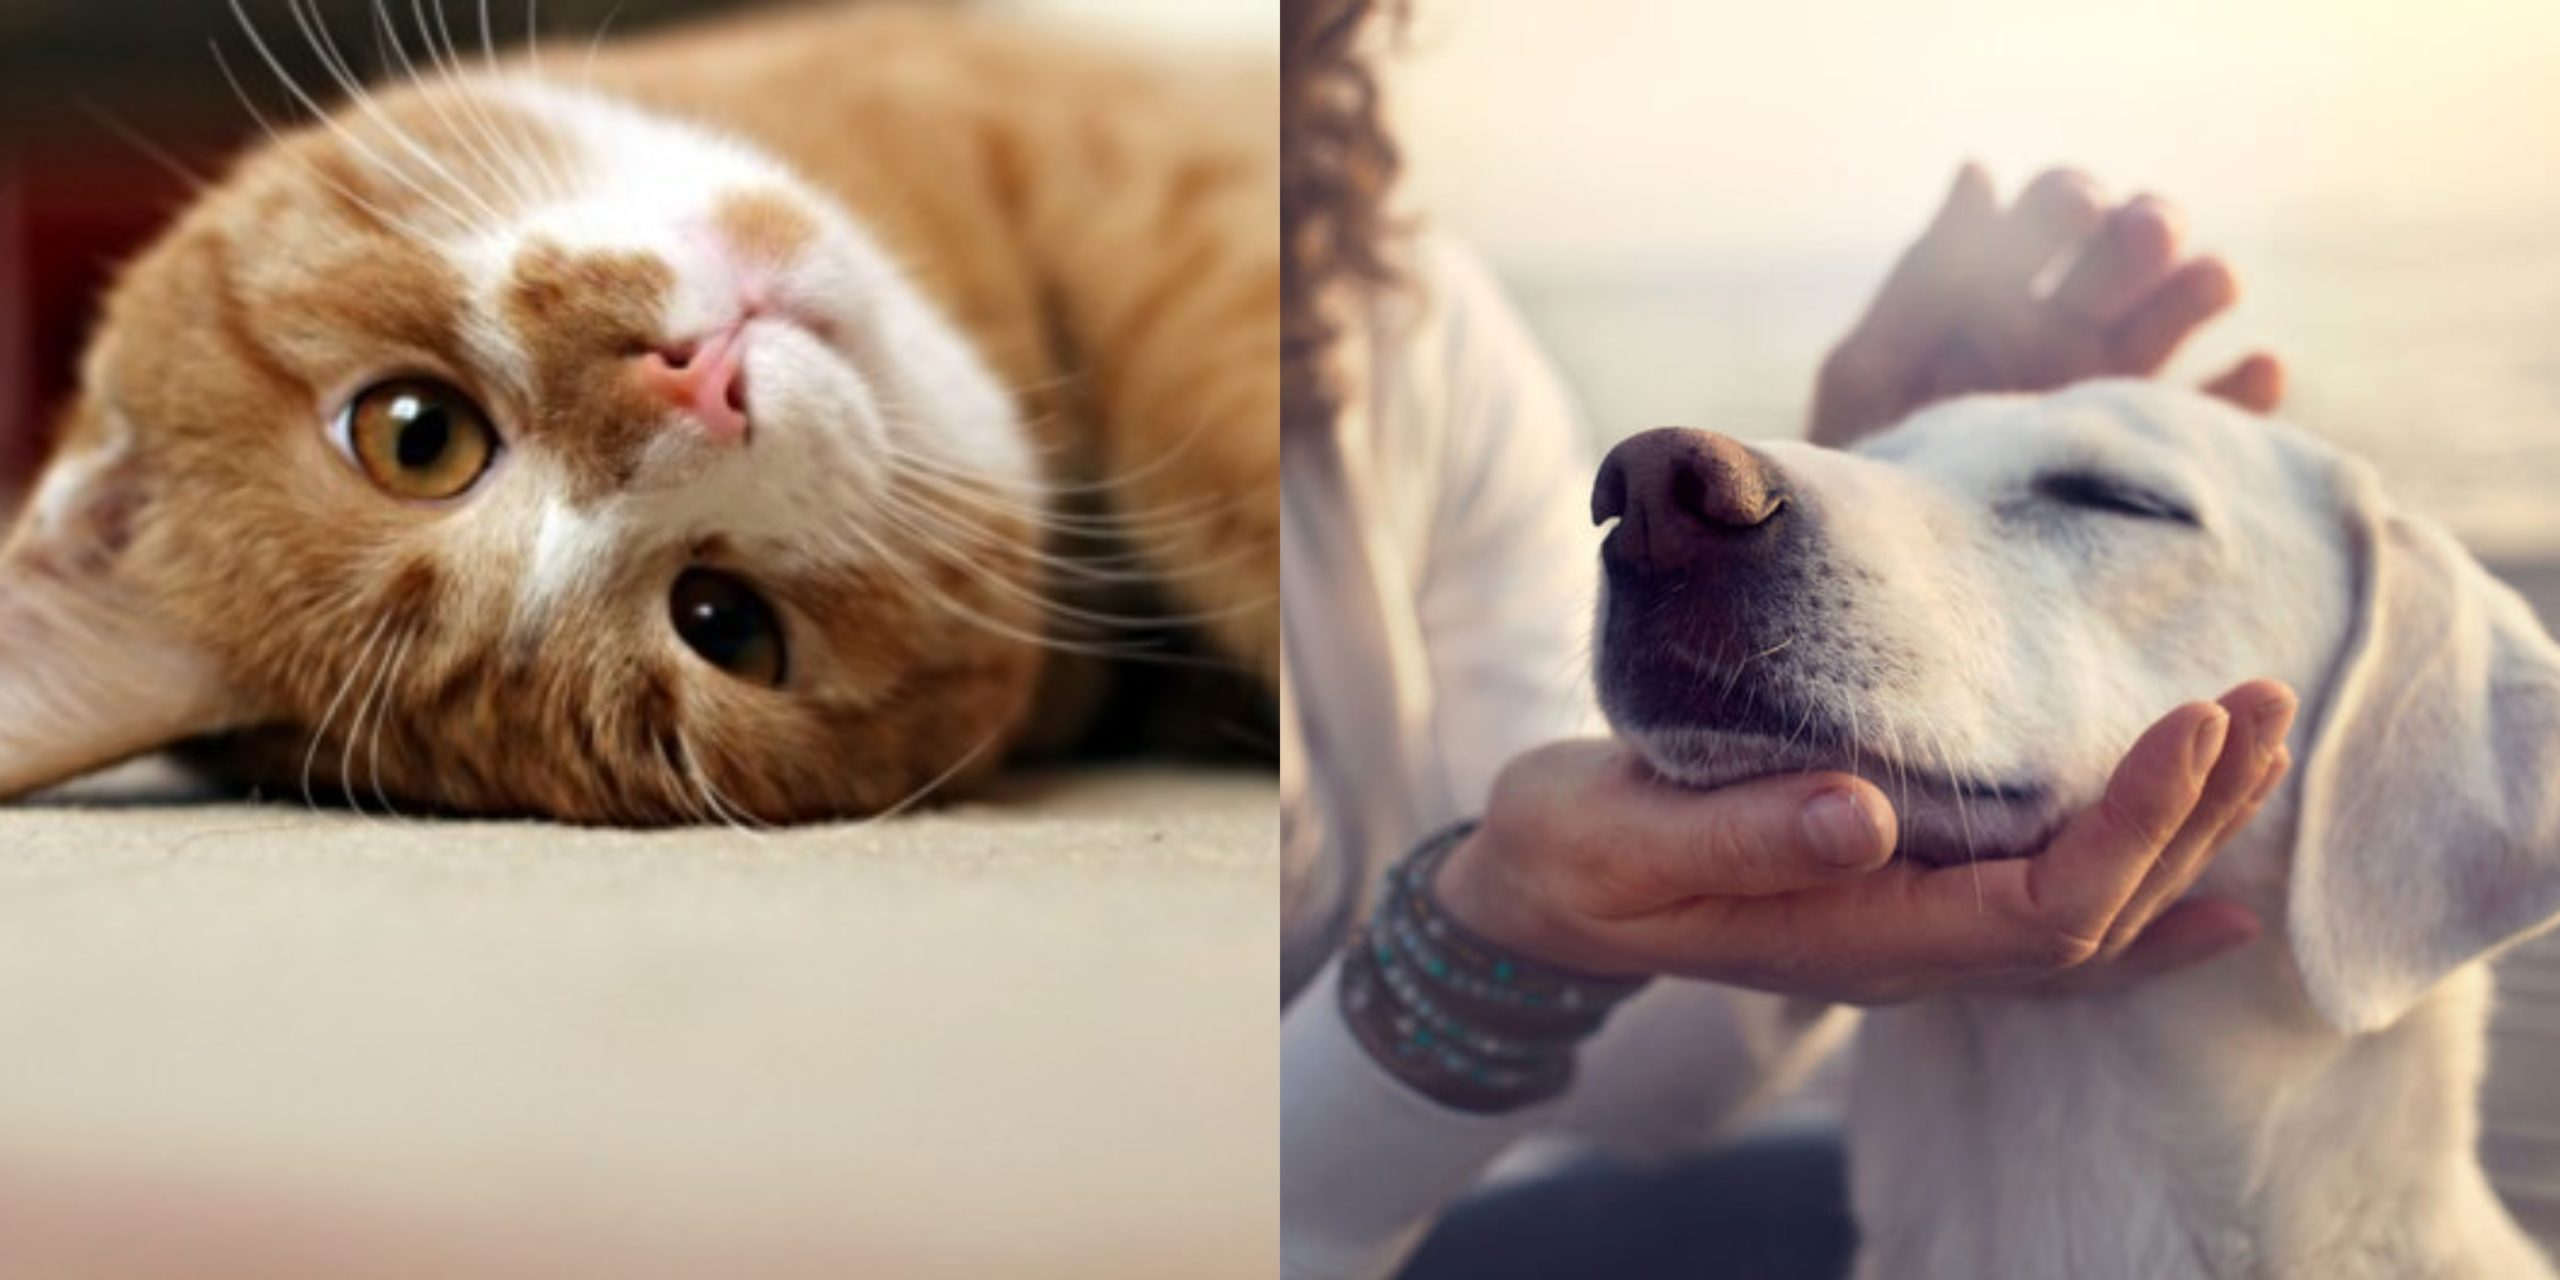 Awas Makanan Disumbat Paku, Sengaja Ditabur Aniaya Kucing & Anjing Kelaparan